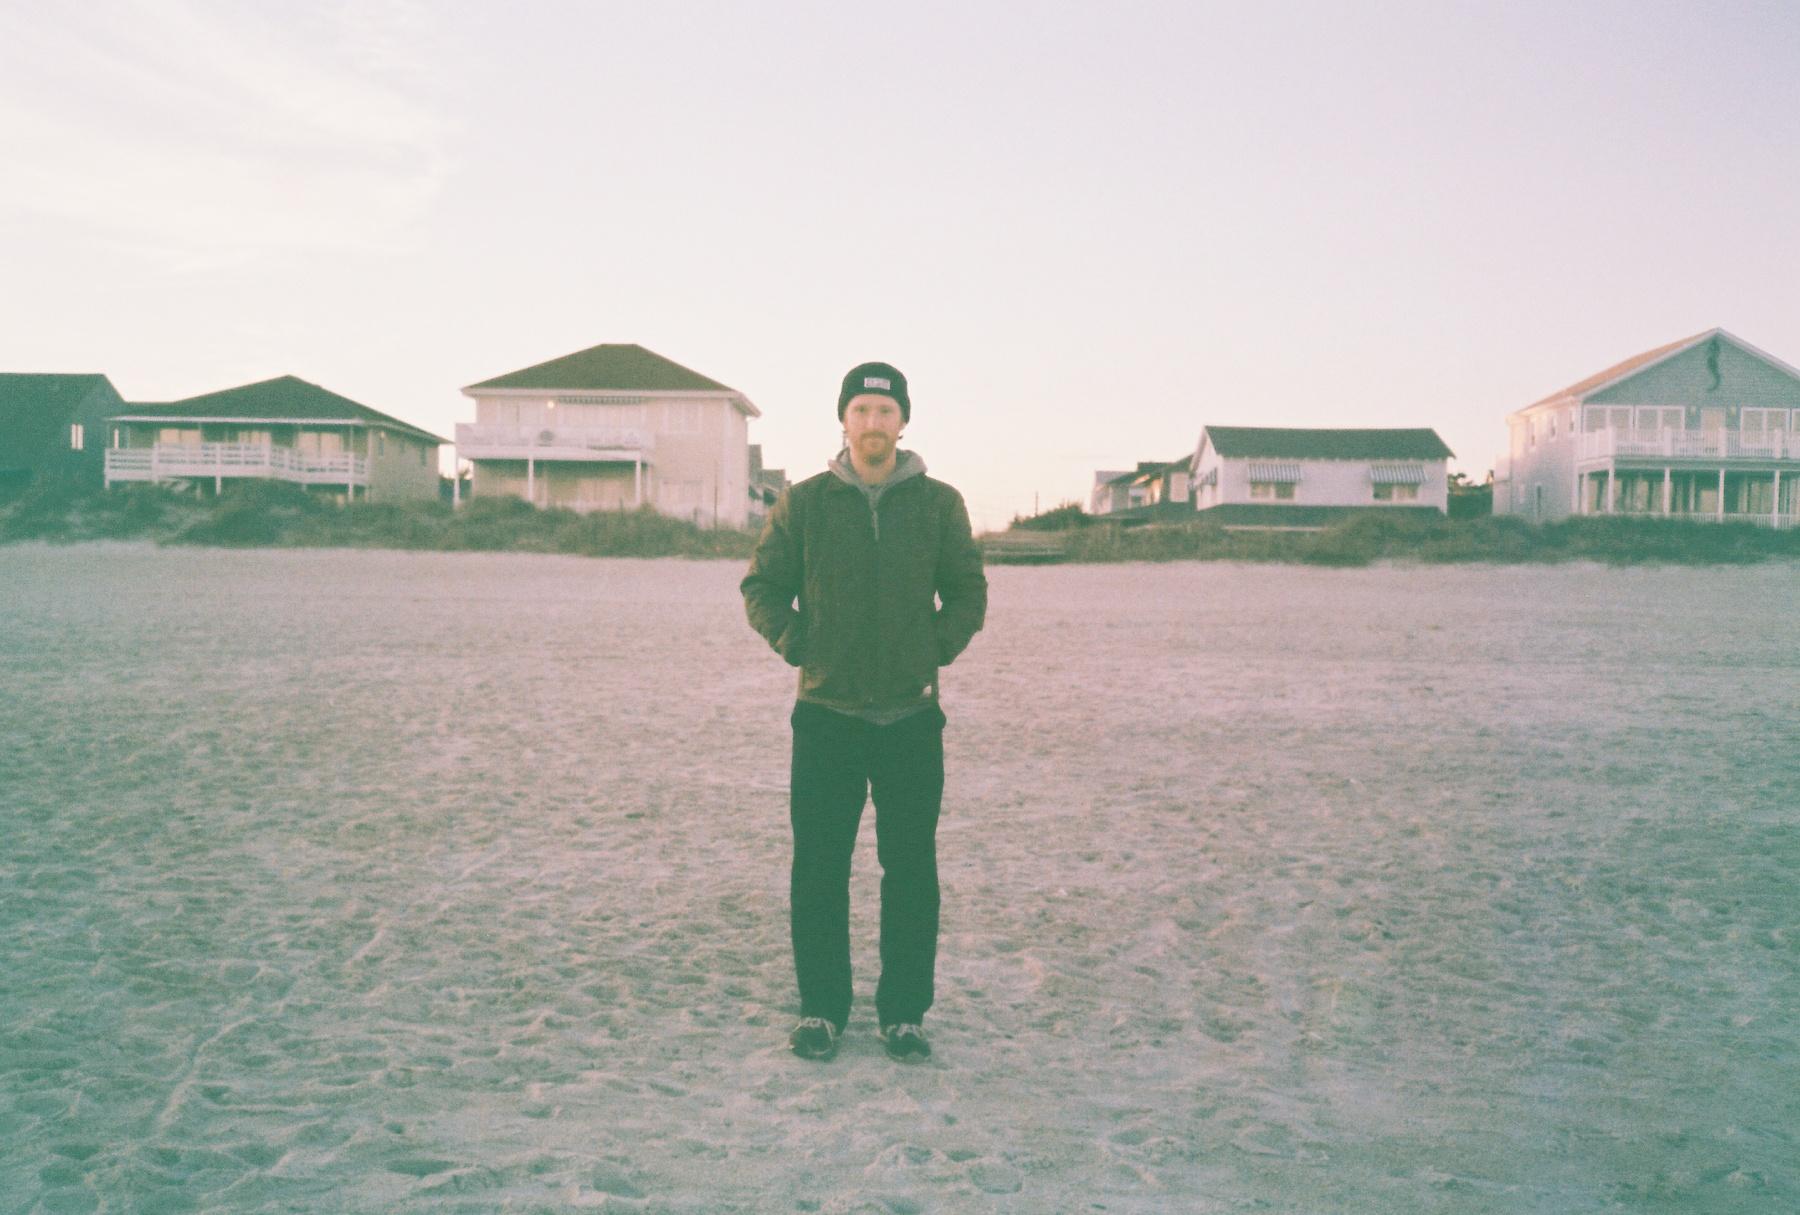 Self-portait. Carolina Beach, NC.